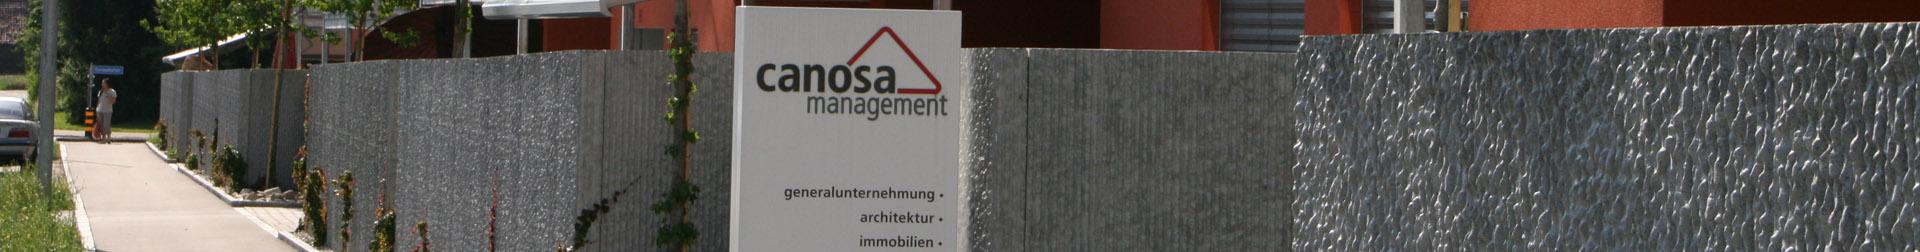 Canosa Management Standort